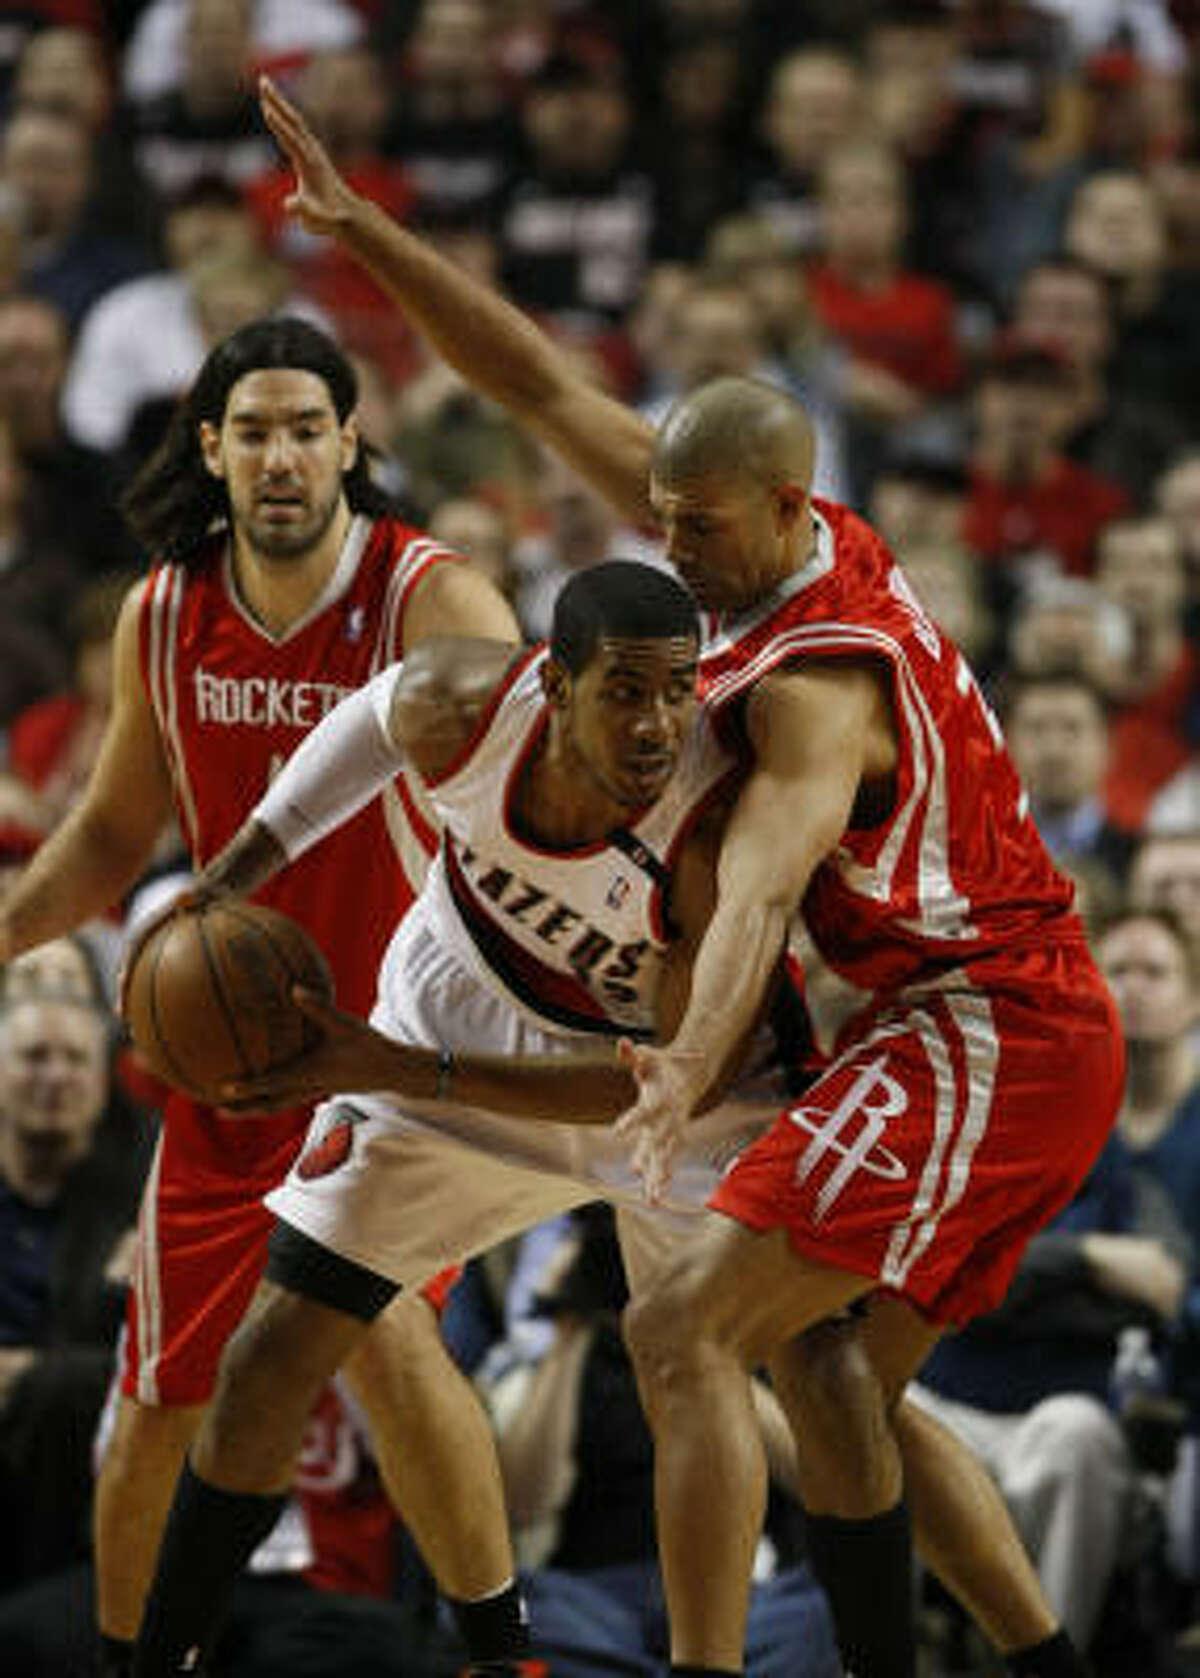 Trail Blazers forward LaMarcus Aldridge (12) is double teamed by Rockets forward Luis Scola (4), back and forward Shane Battier (31).